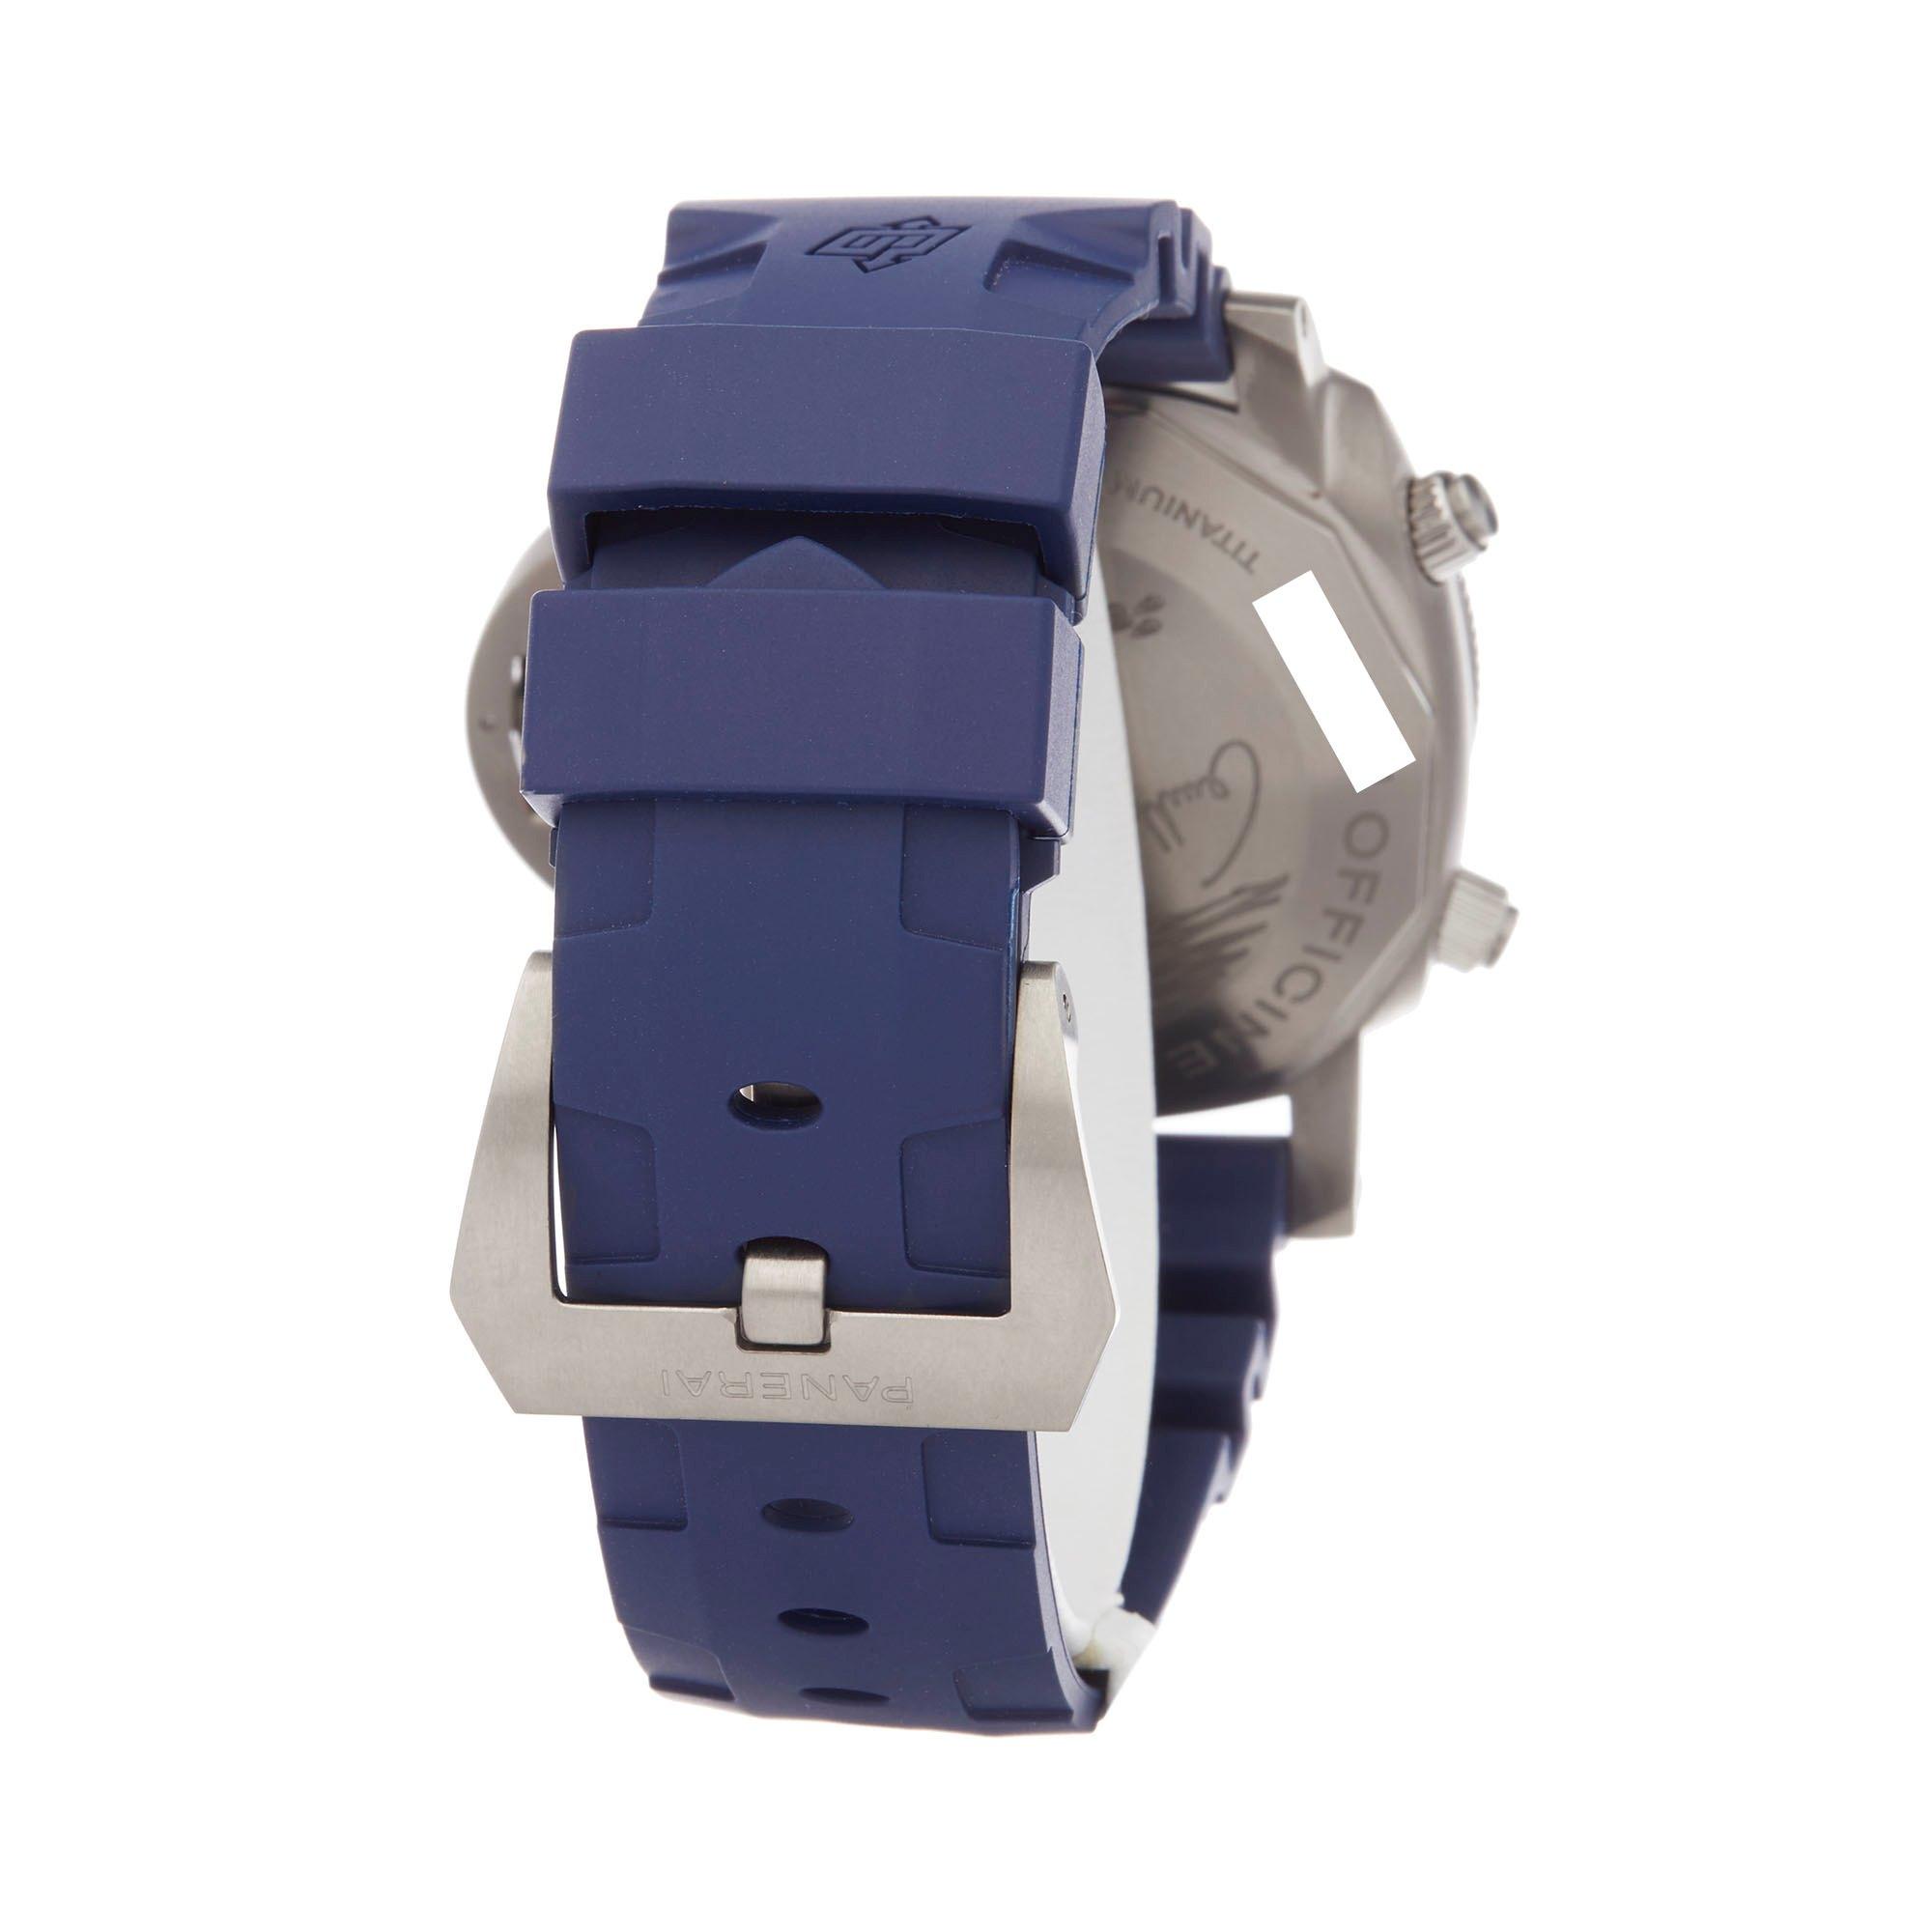 Panerai Luminor Submersible Chronograph Roestvrij Staal PAM00982